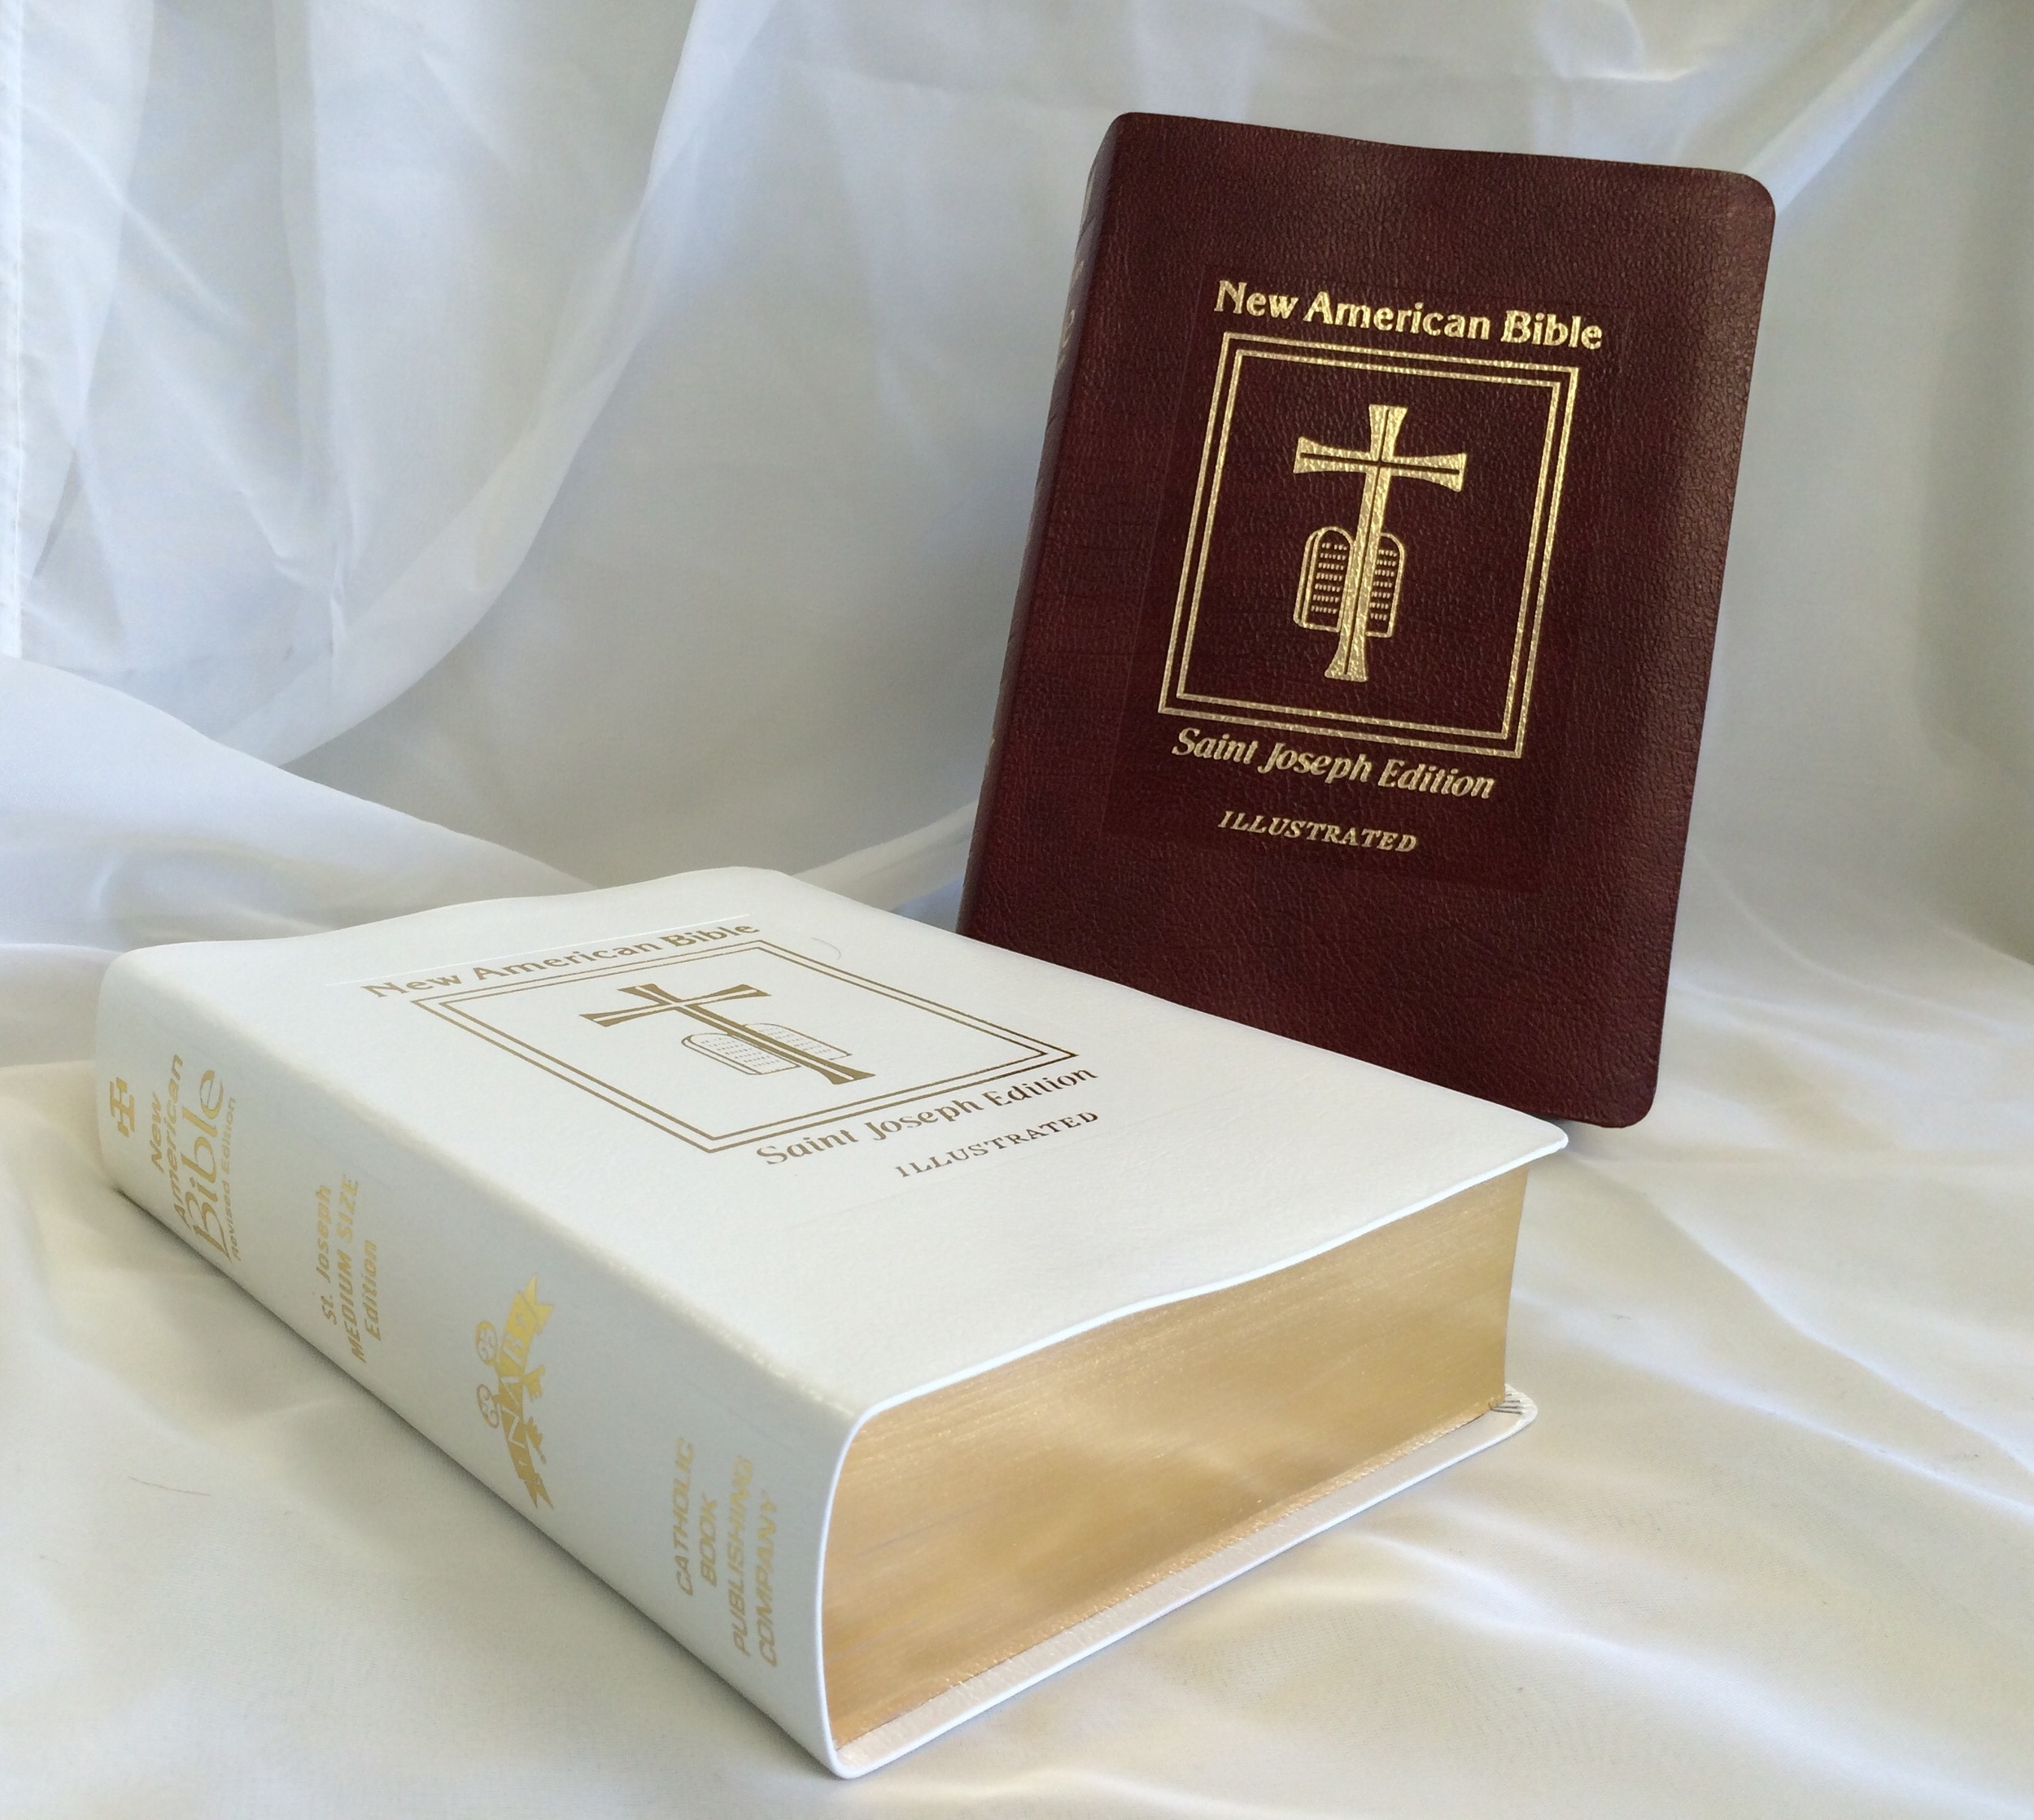 NAB St. Joseph Edition $38.95